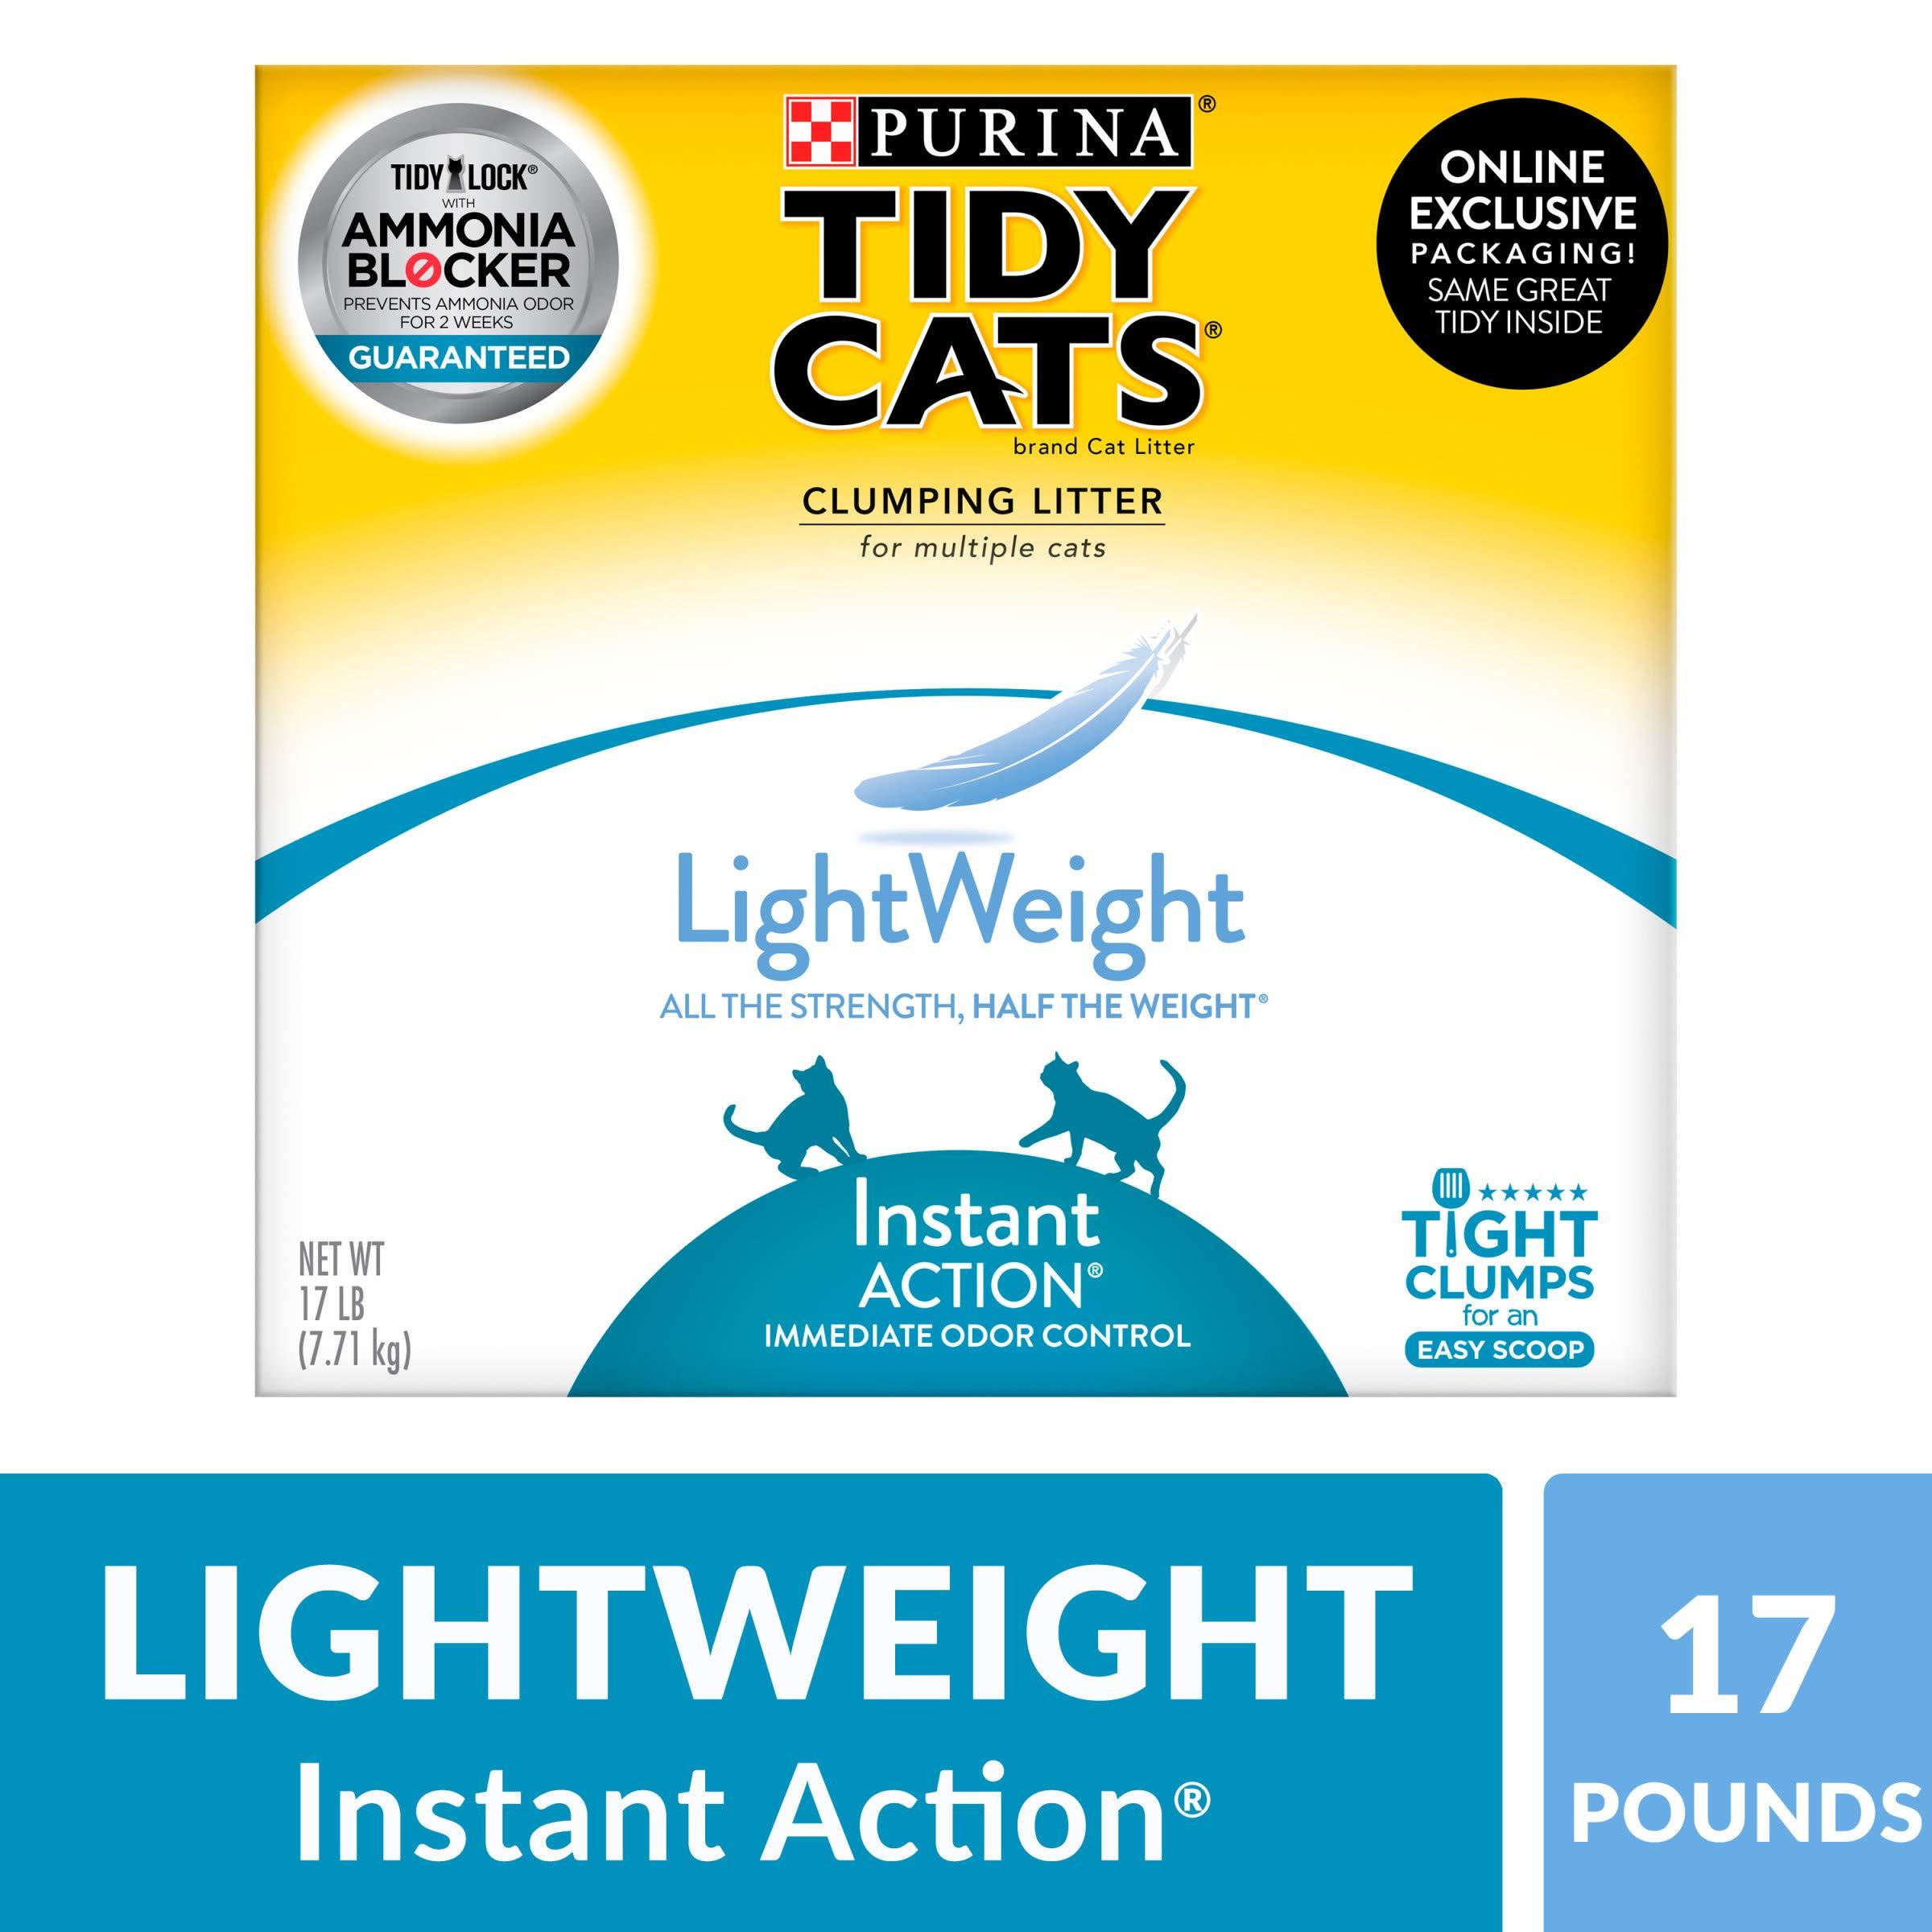 Purina Tidy Cats Light Weight, Dust Free, Clumping Cat Litter; LightWeight Instant Action Multi Cat Litter - 17 lb. Box